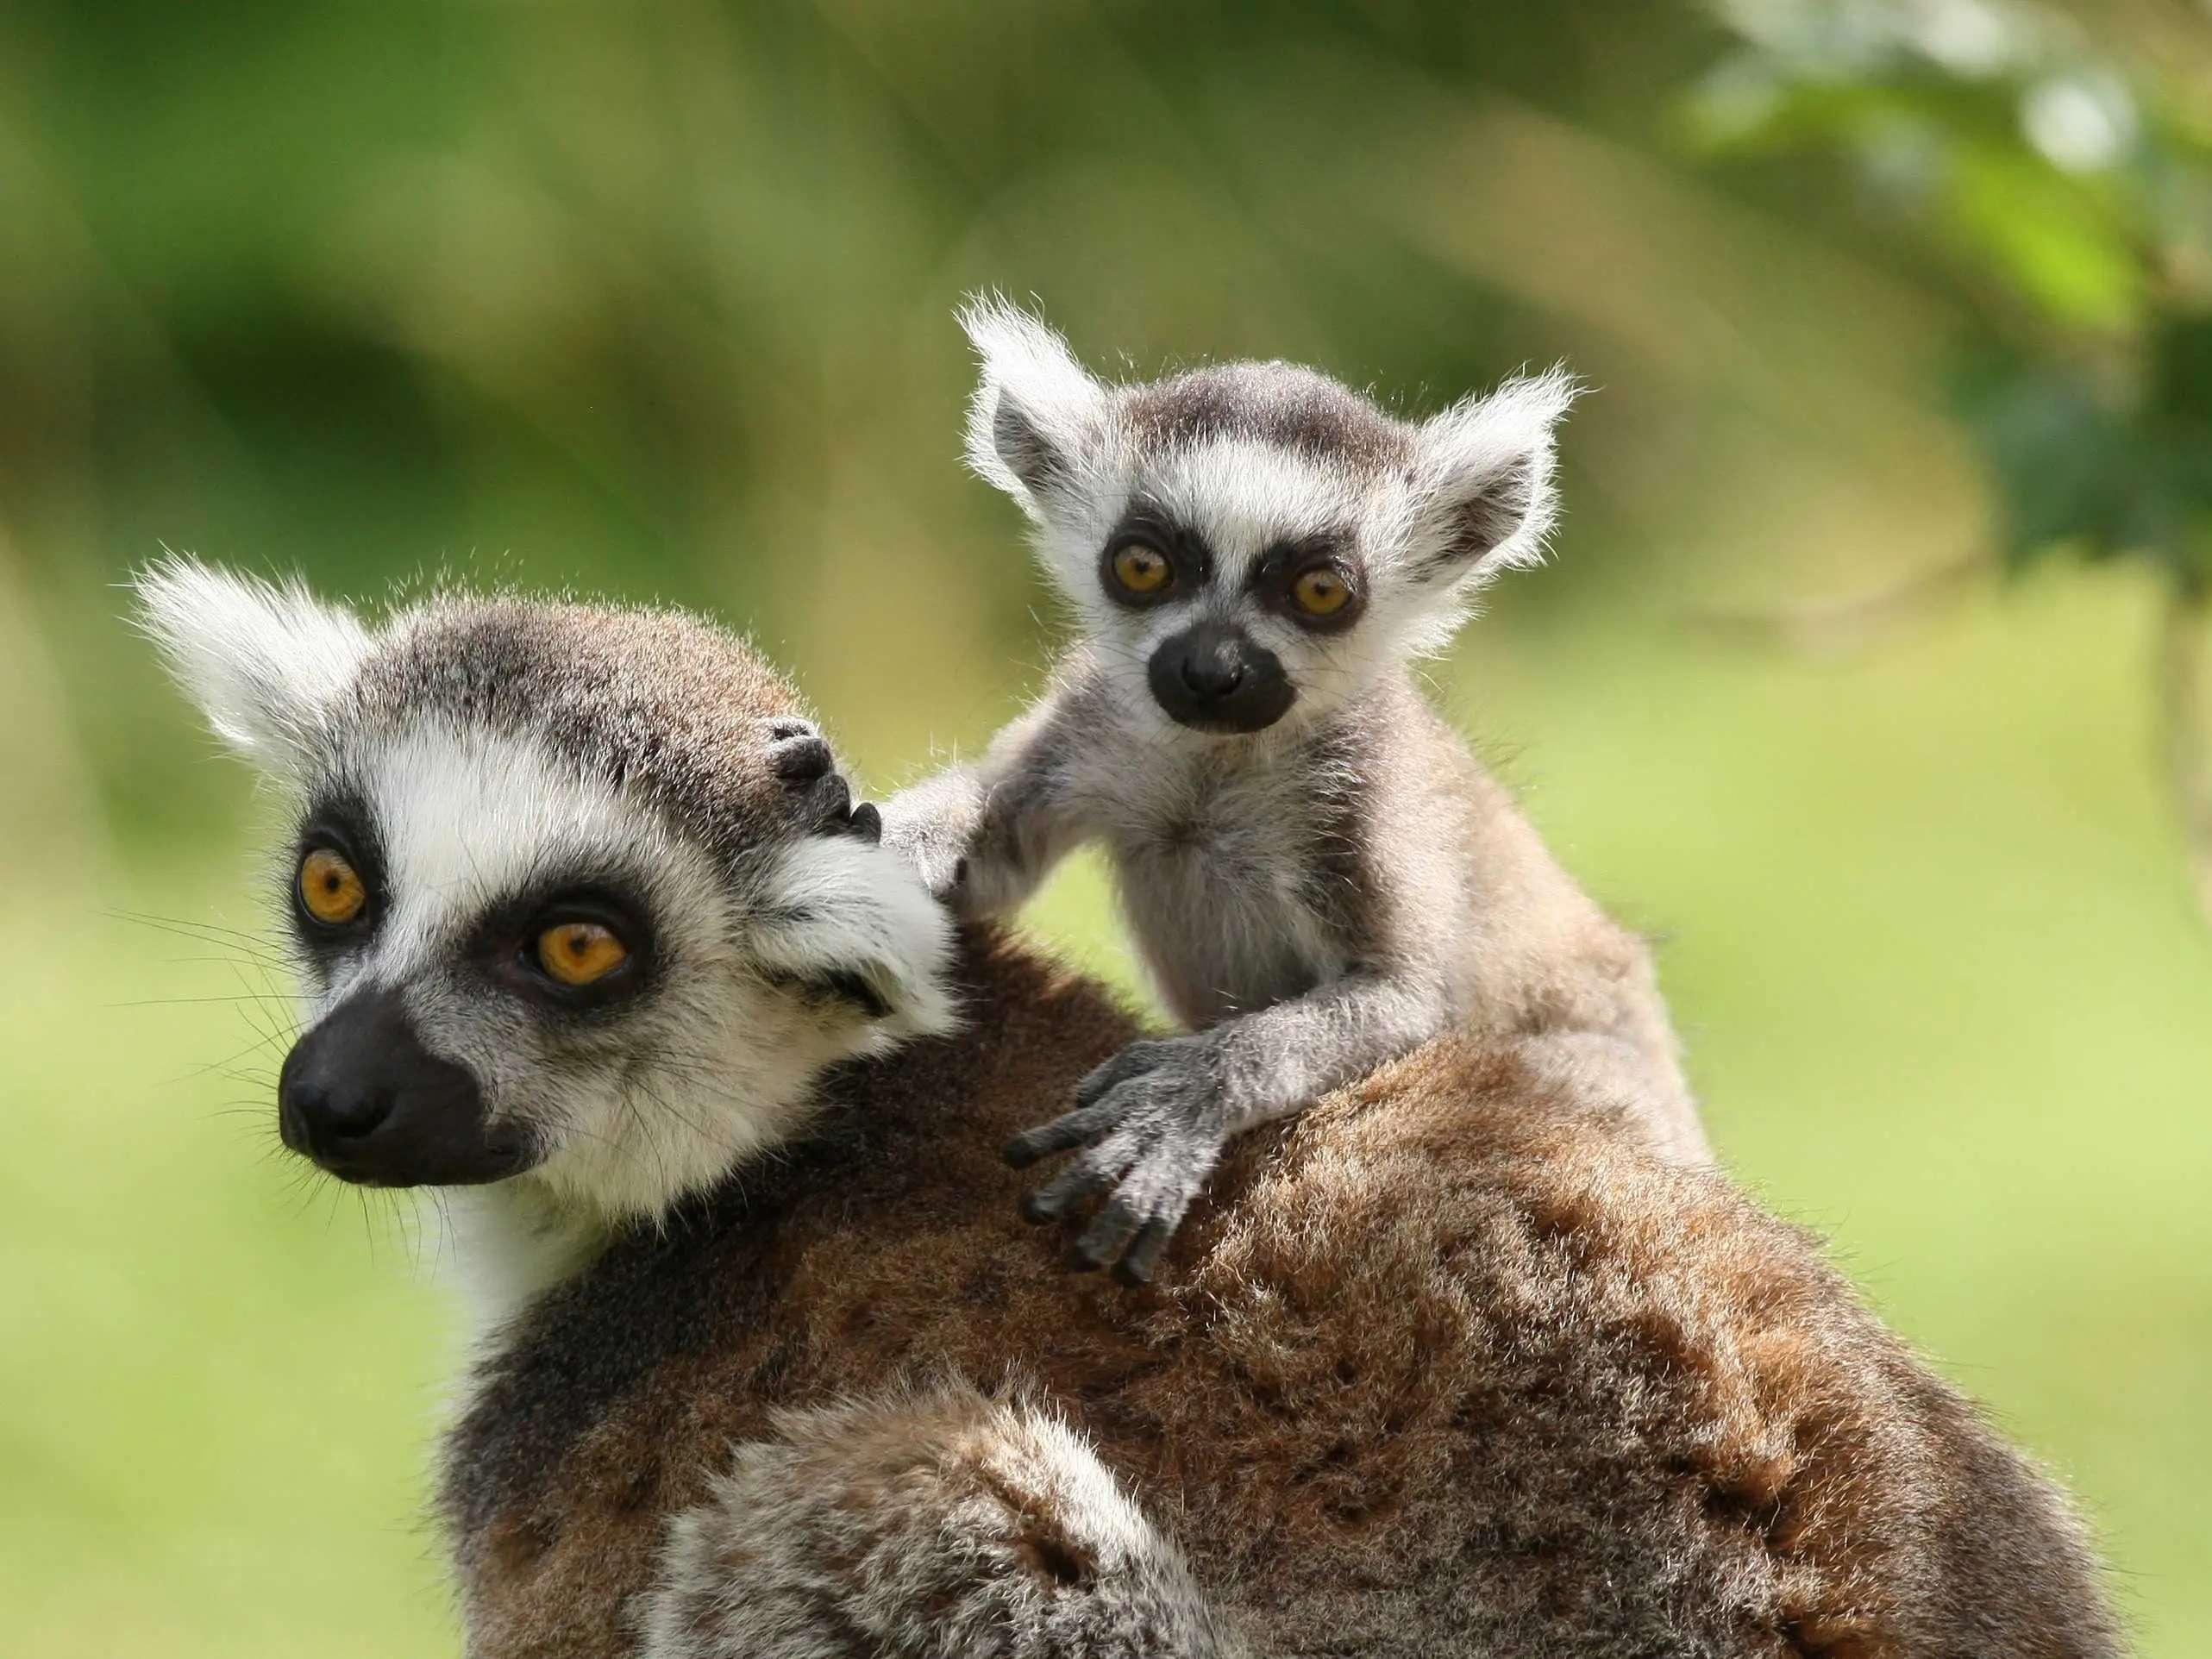 Snap a photo of Madagascar's playful, bushy-tailed lemurs.